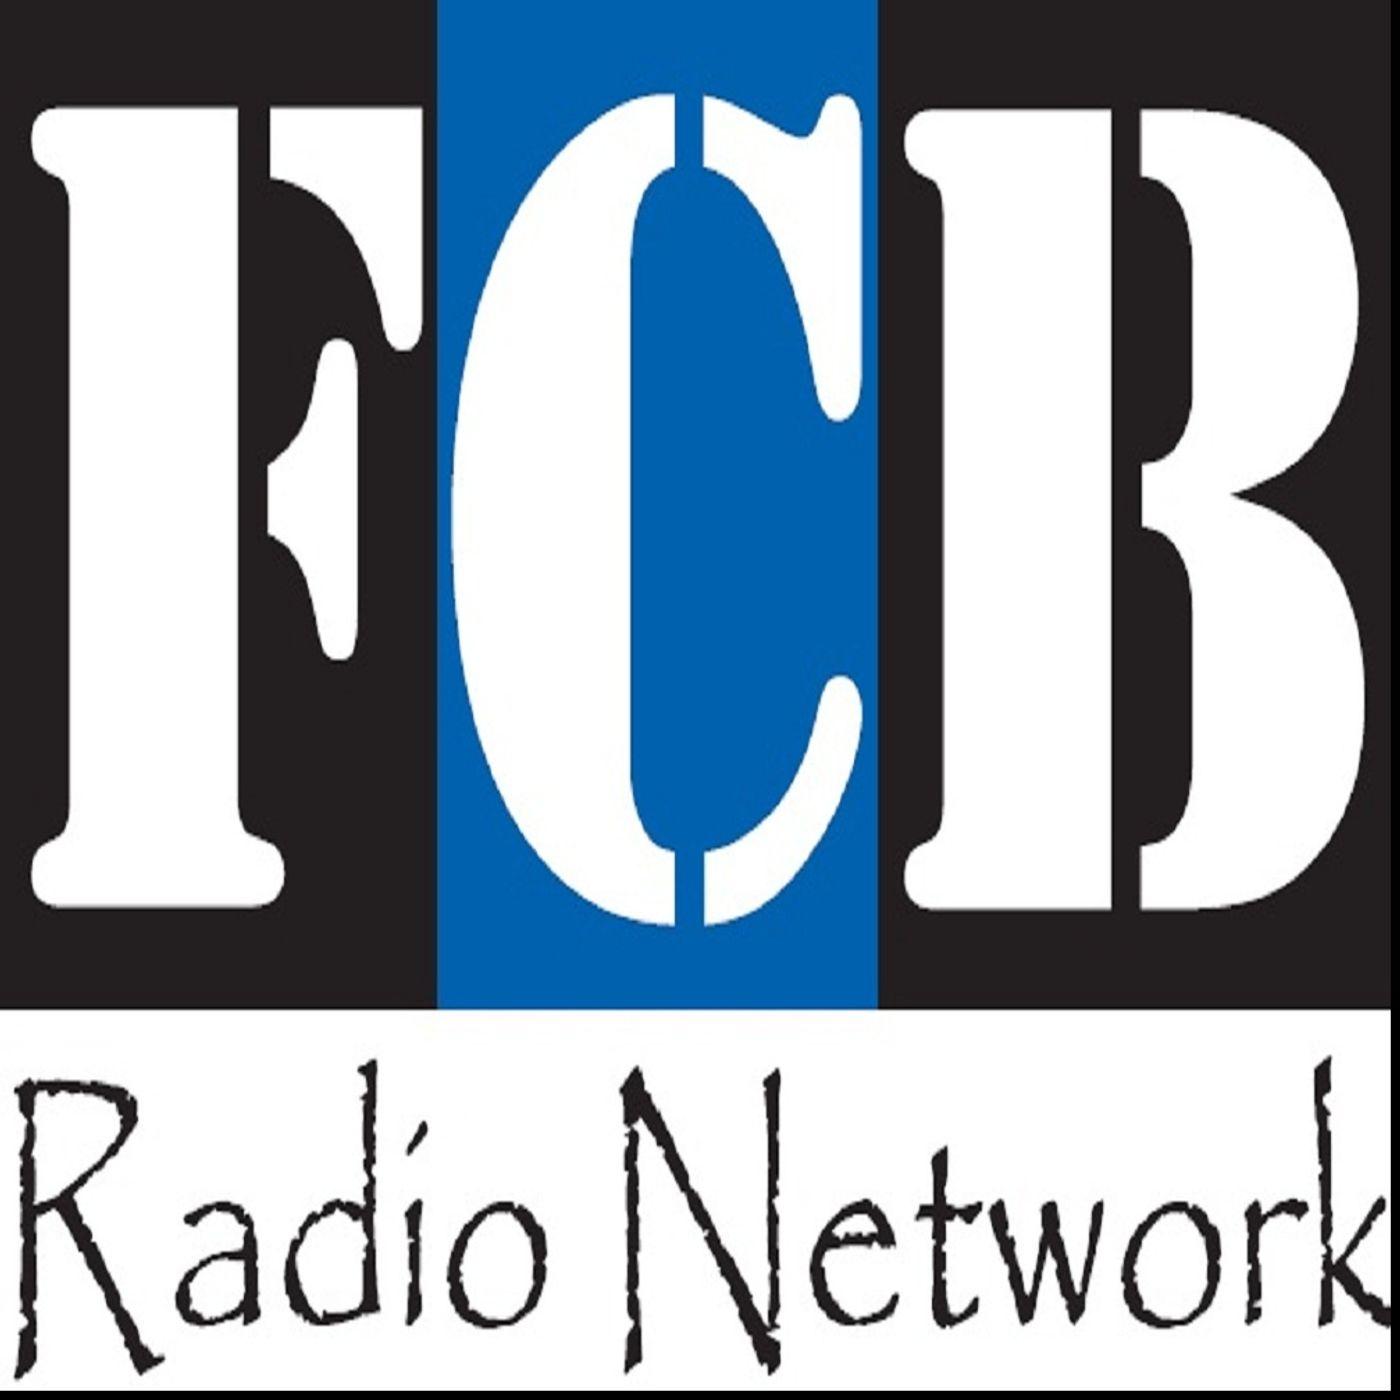 Special CPAC Coverage. Dan Bongino, Burgess Owens and Sebastian Gorka interviews and more